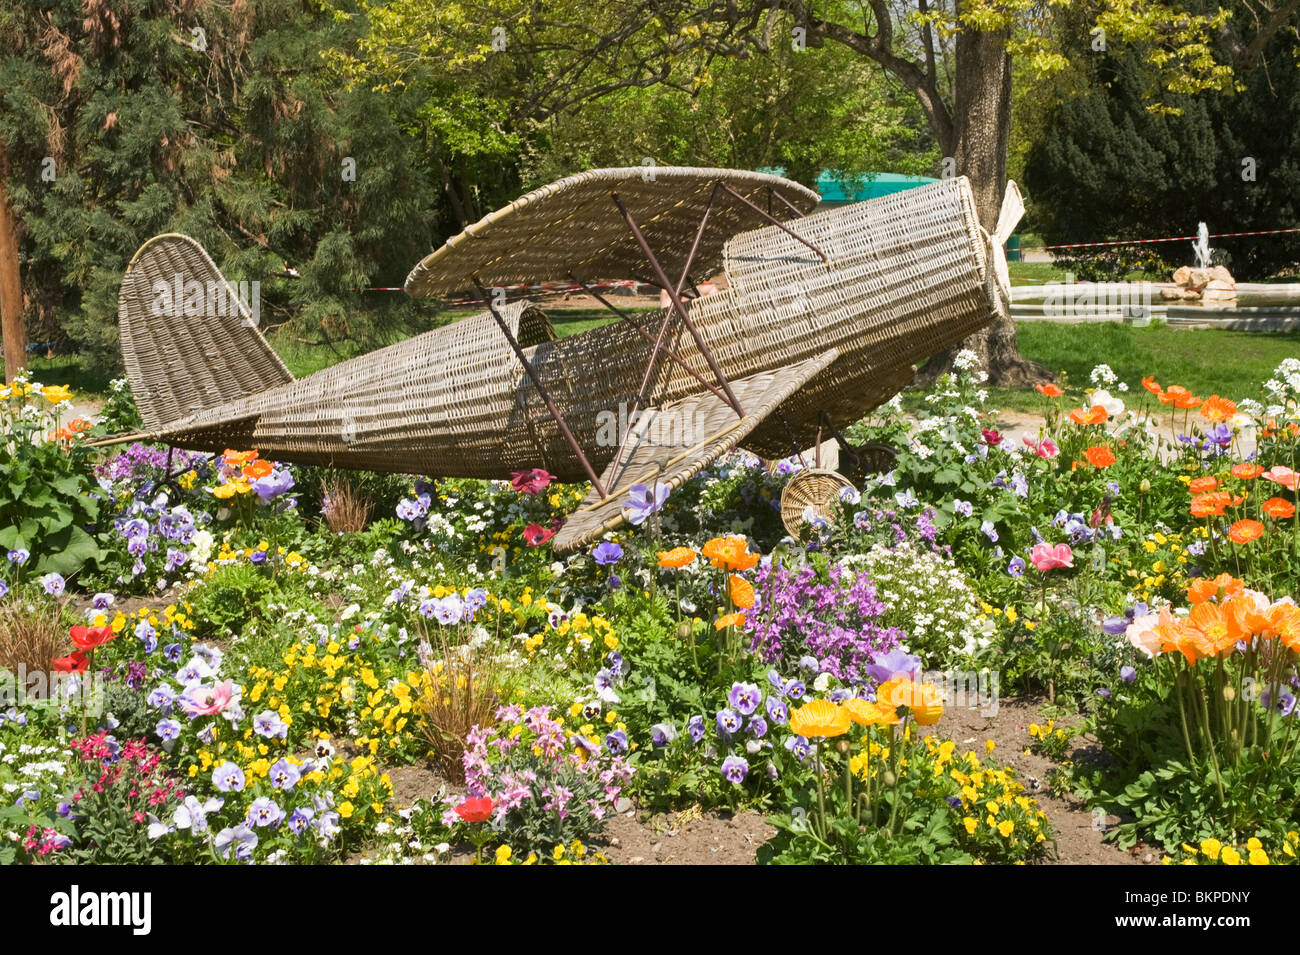 Model Of Raffia Biplane Set Amongst Colurful Flower Bed In Jardin Des Stock Photo Alamy